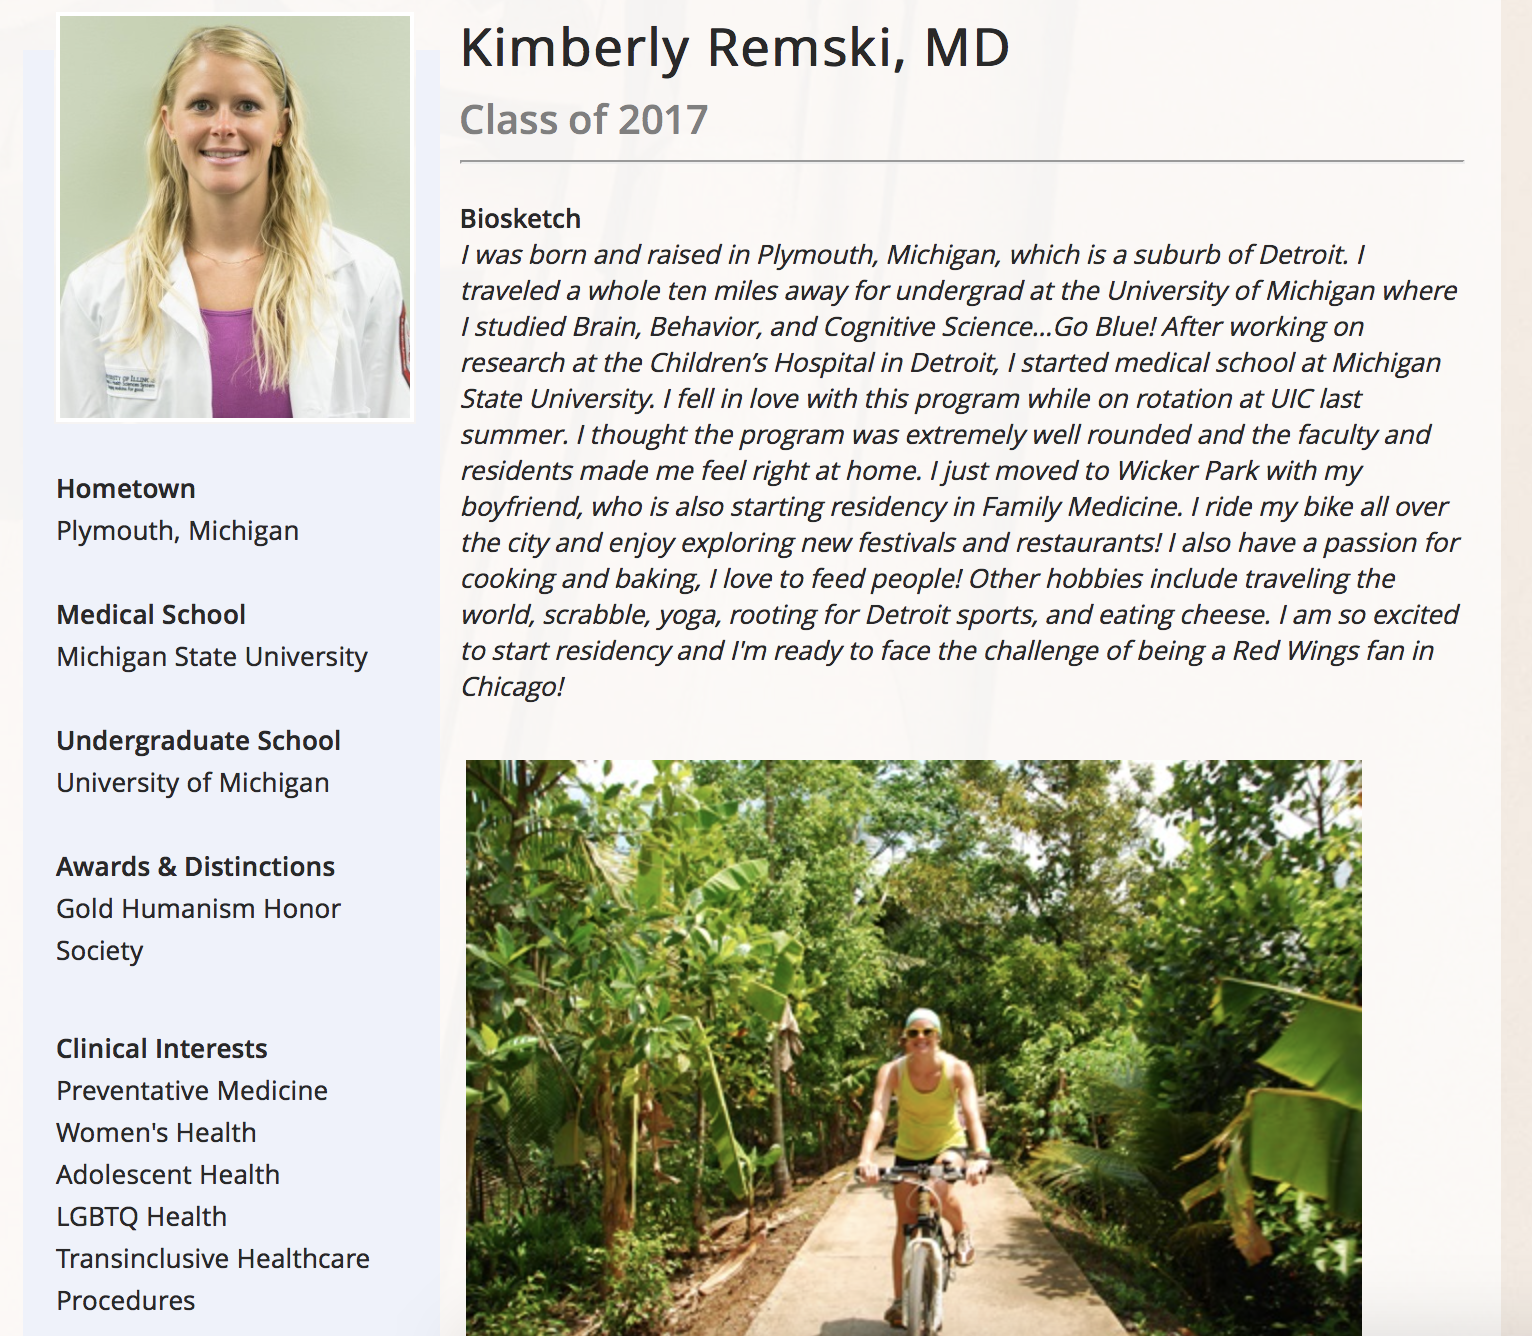 Kimberly Remski, MD -- Class of 2017 - Biosketch